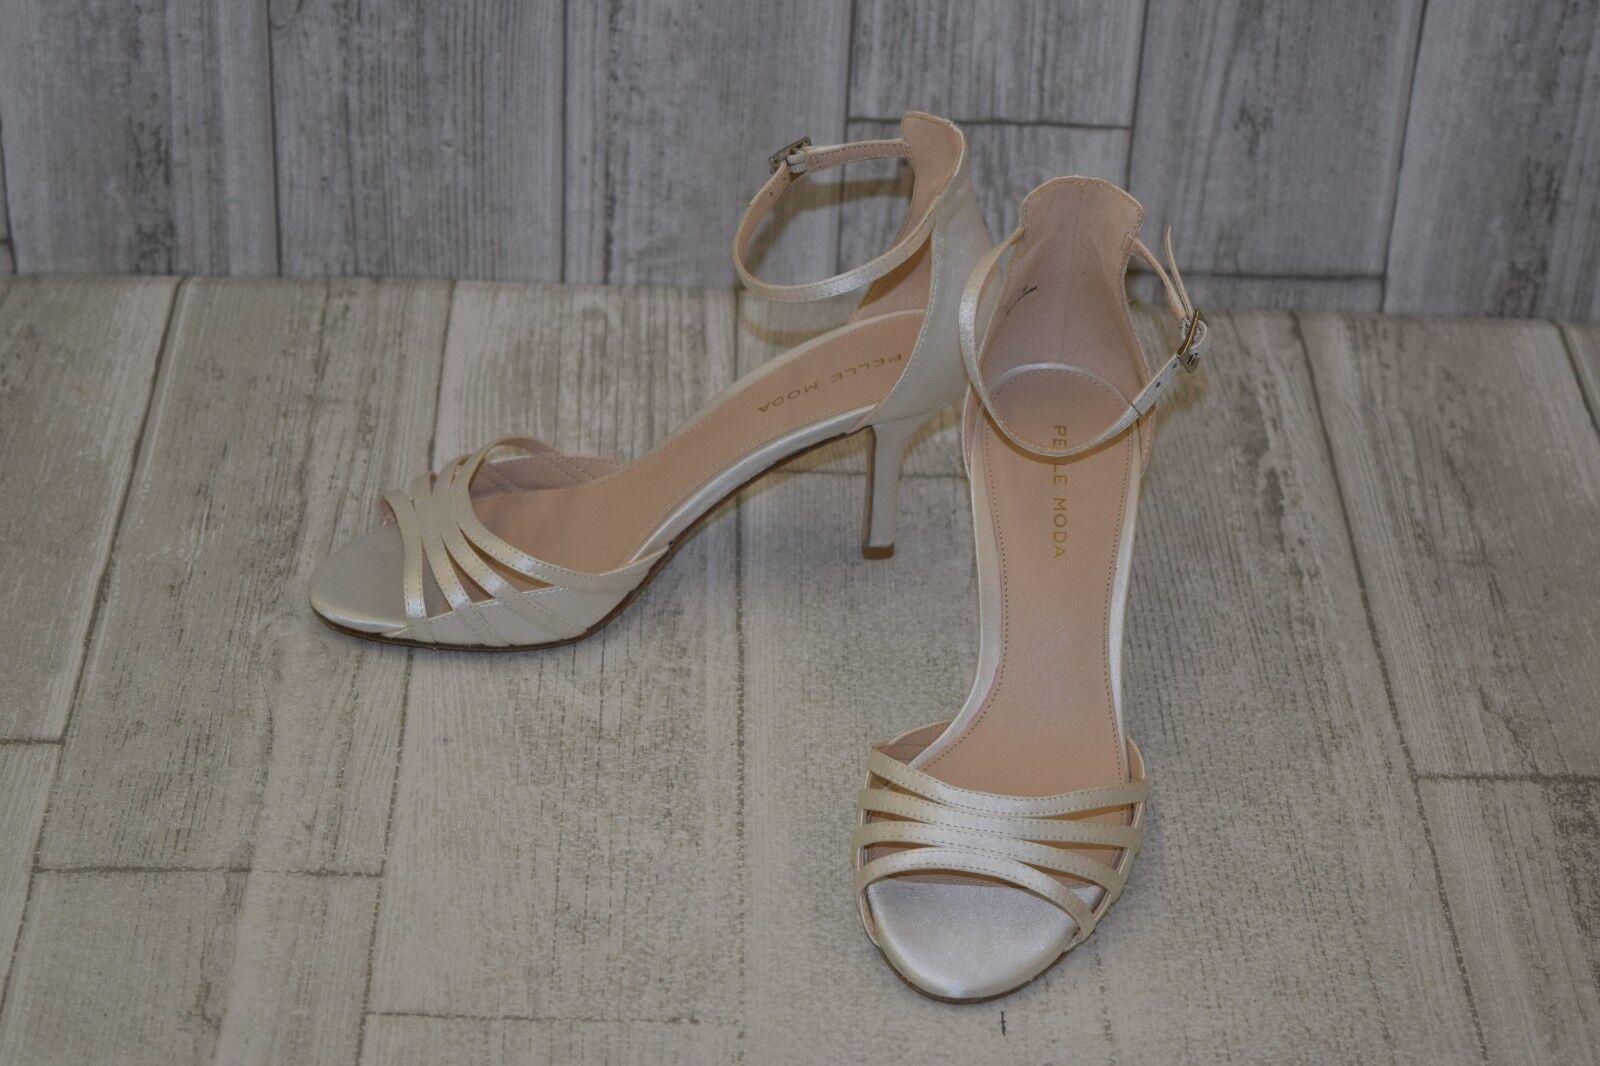 Pelle Moda Isabel 2 Ankle Strap Sandals, Women's Women's Women's Size 7M, White cd0134